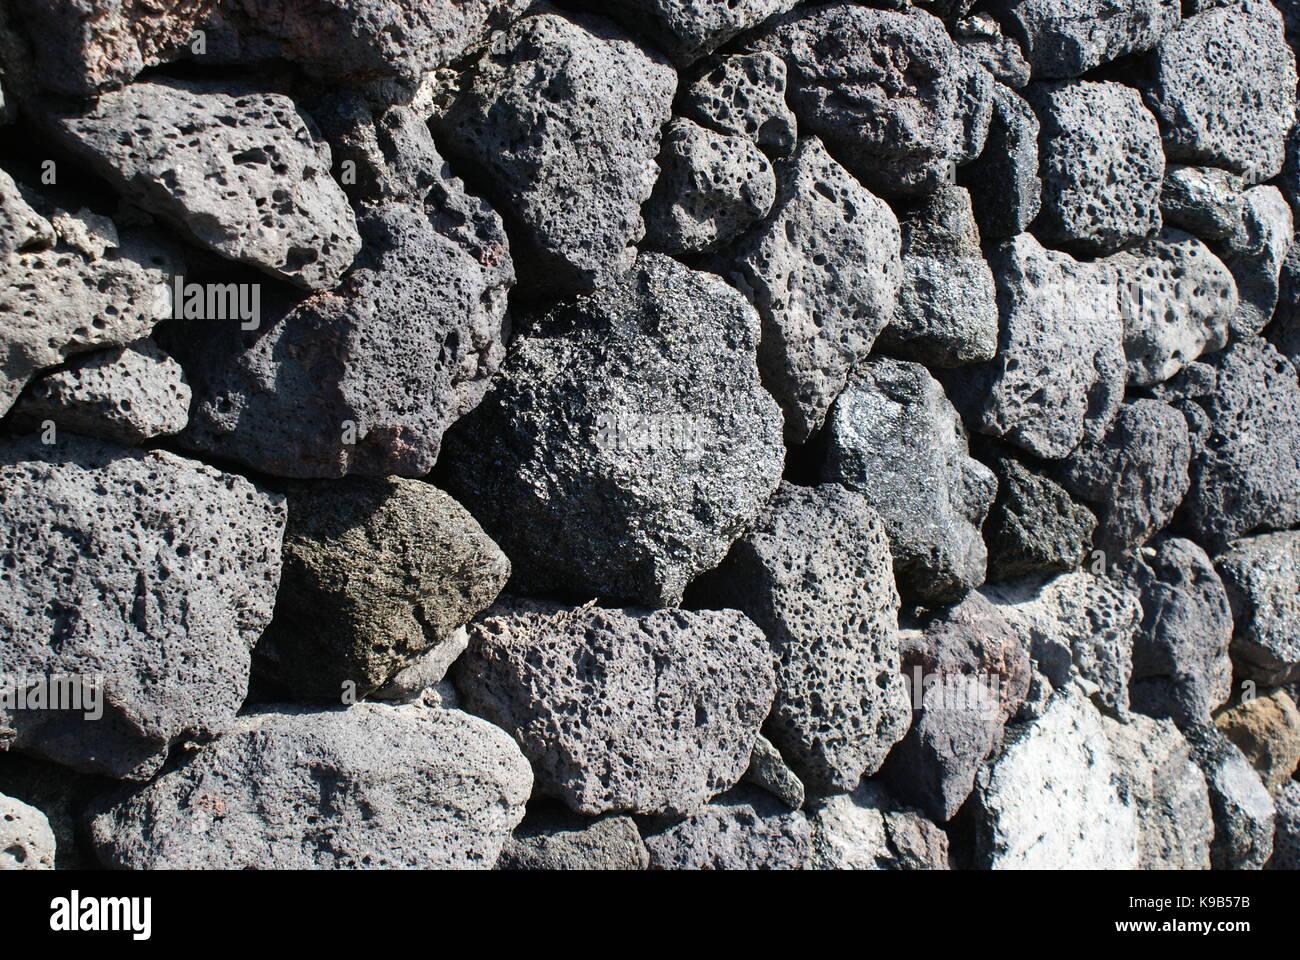 Basalt Stone Wall : Black basalt stock photos images alamy